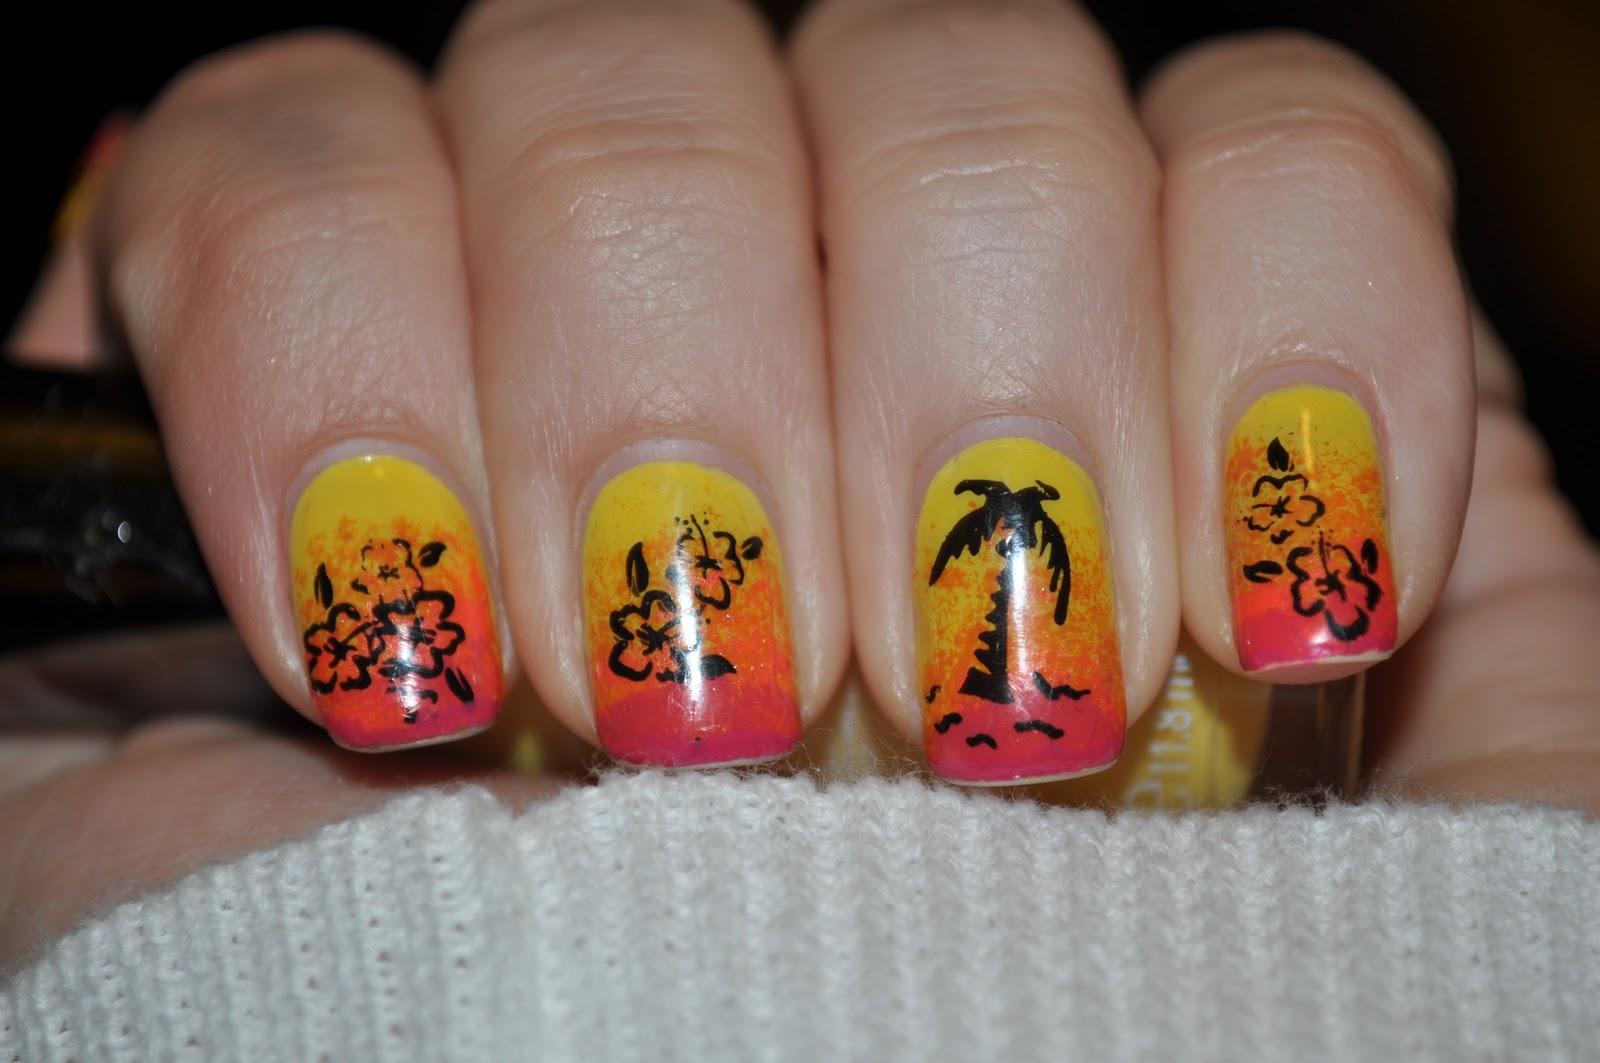 Jessica's Nail Art: Tropical Nails